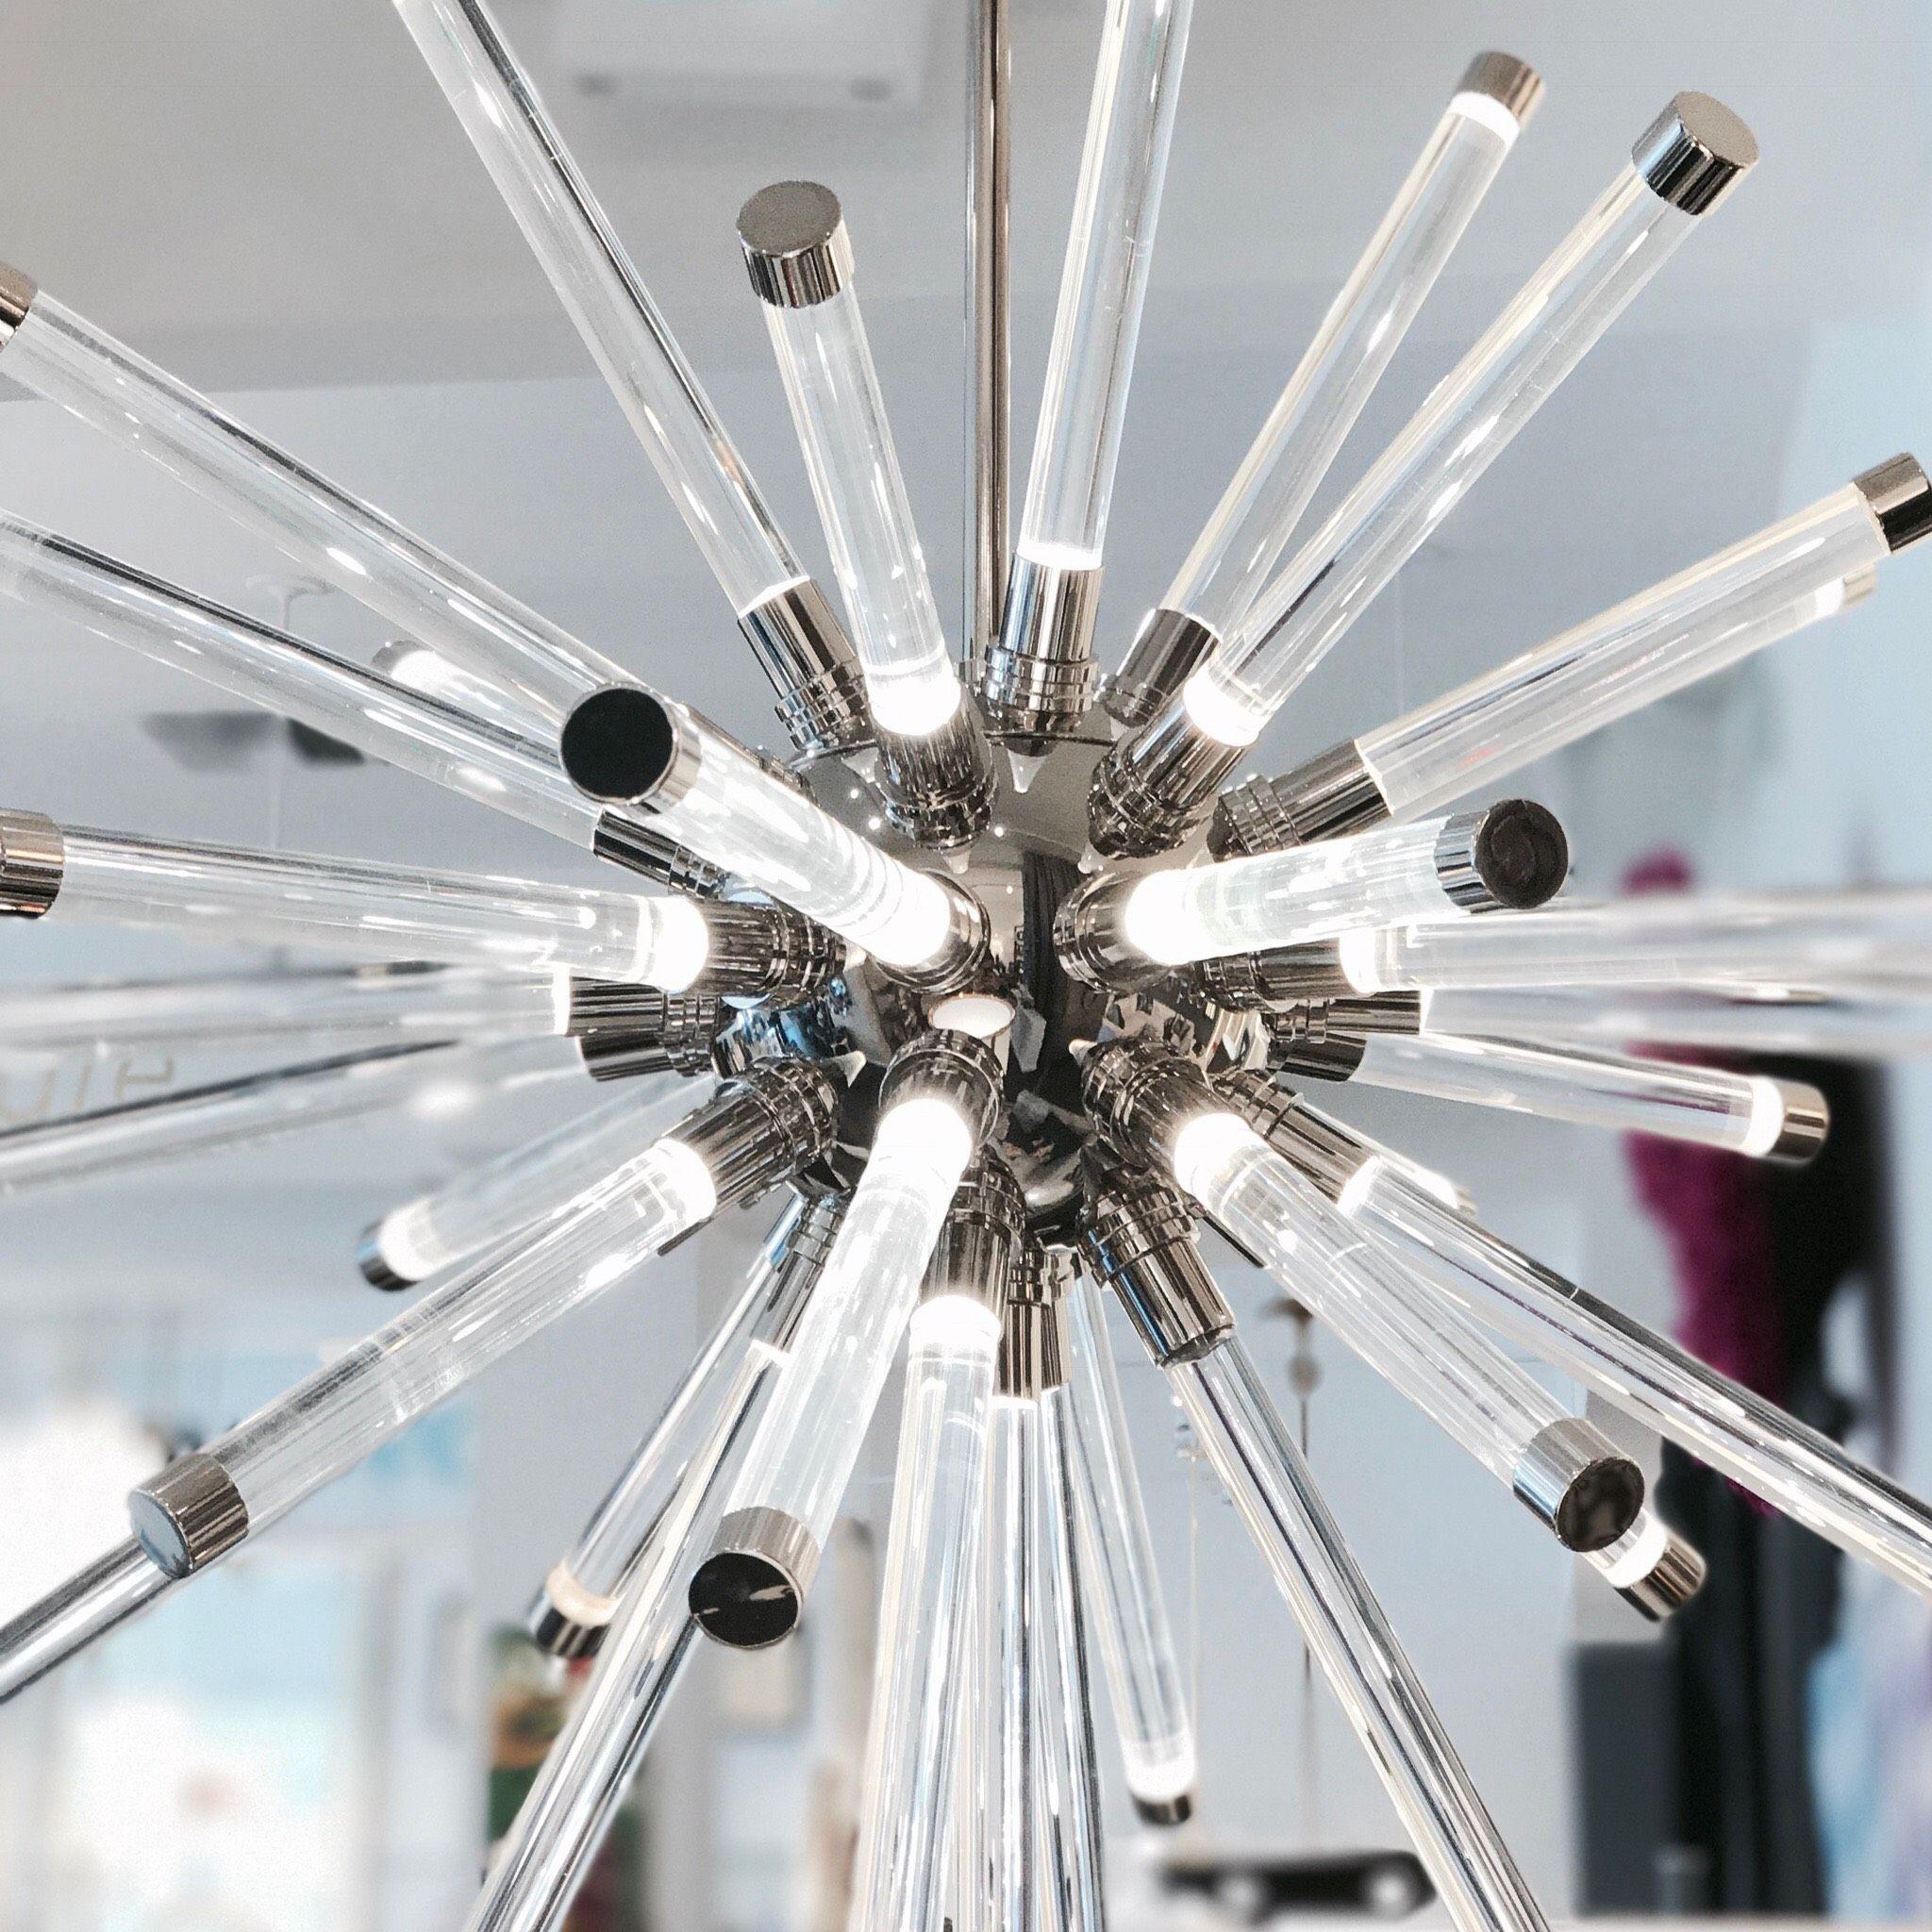 The Jonathan Adler Jacques Sputnik Chandelier is an exploding